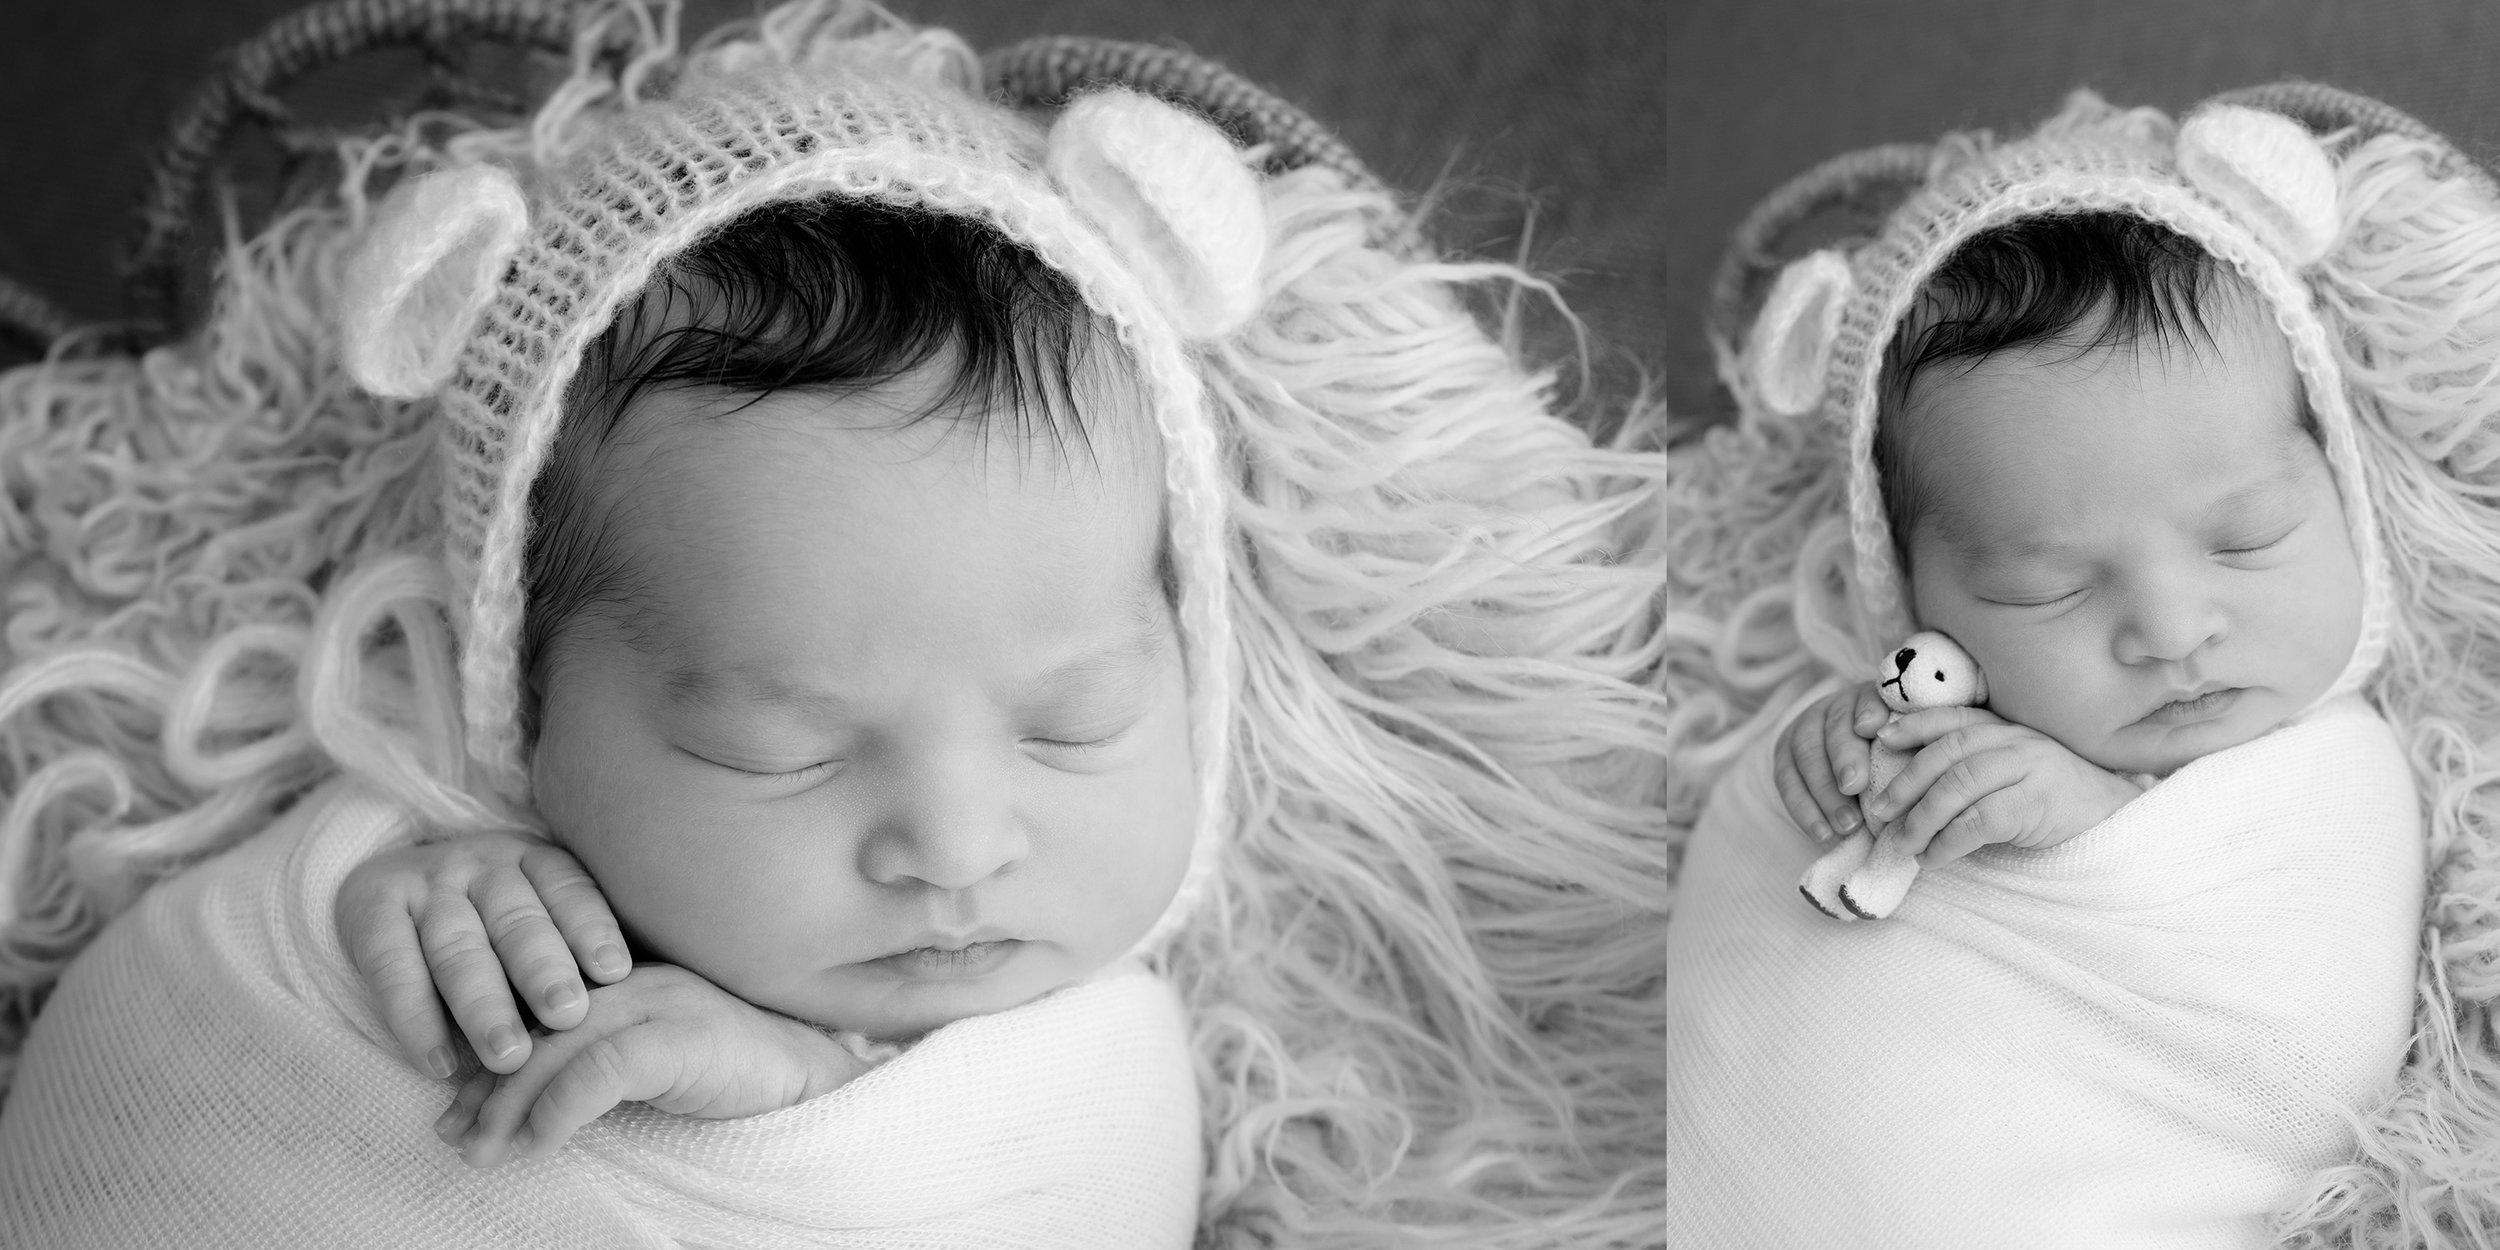 Newborn-photography-simple-black-and-white.jpg